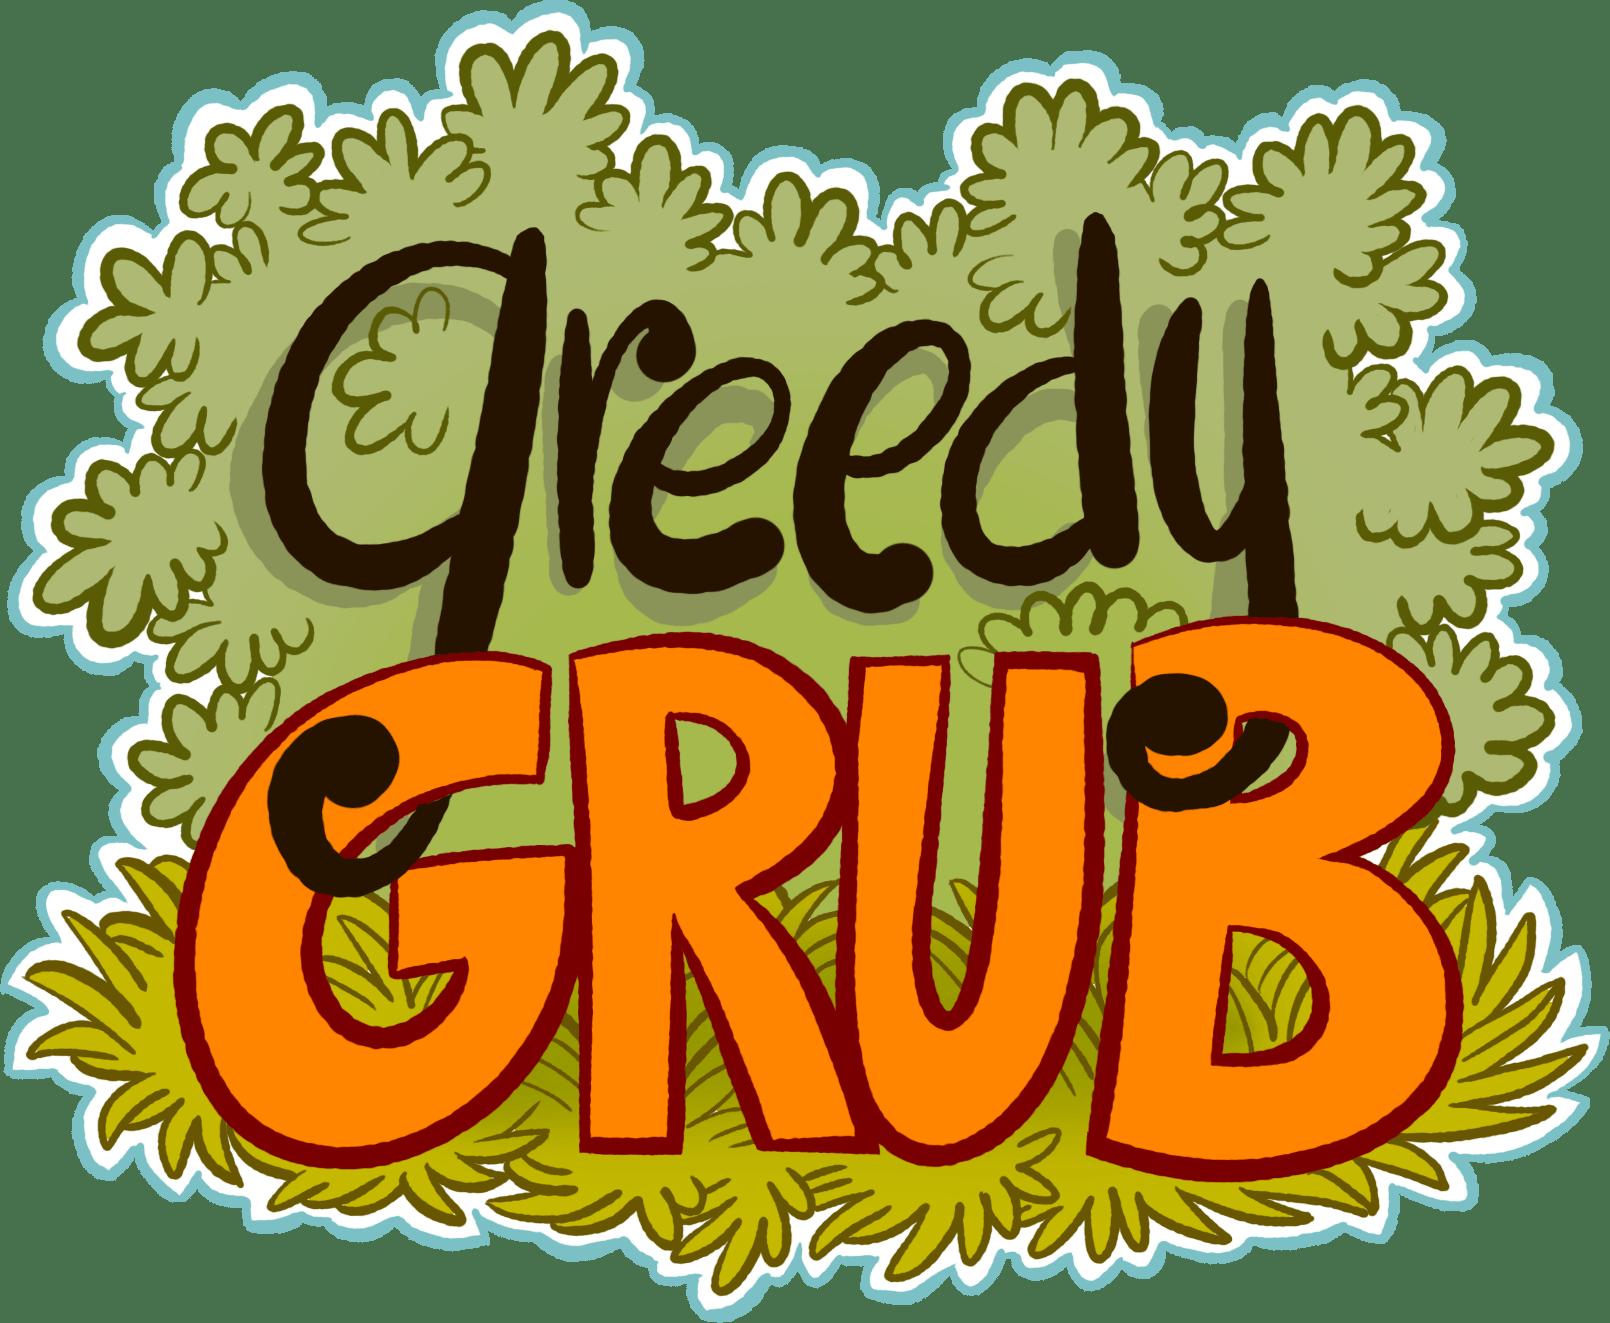 Greedy Grub débarque sur Android